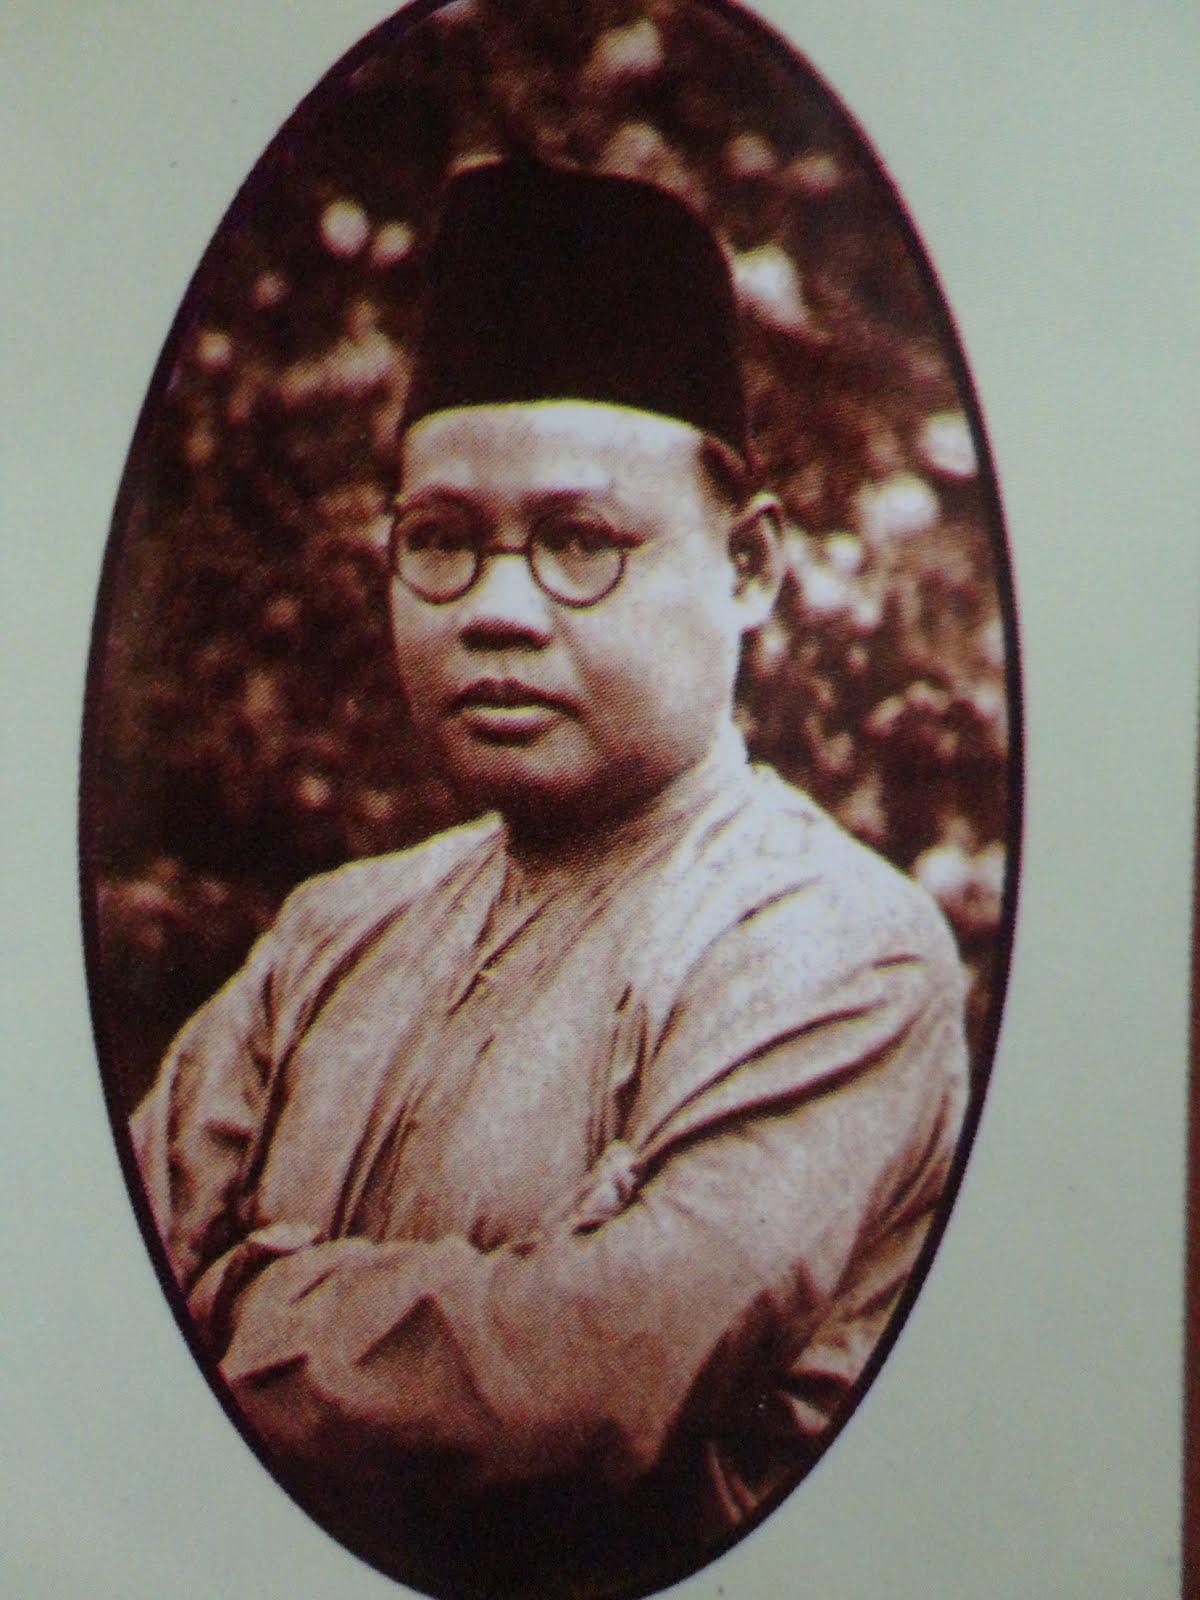 Zainal Abidin Ahmad (writer)